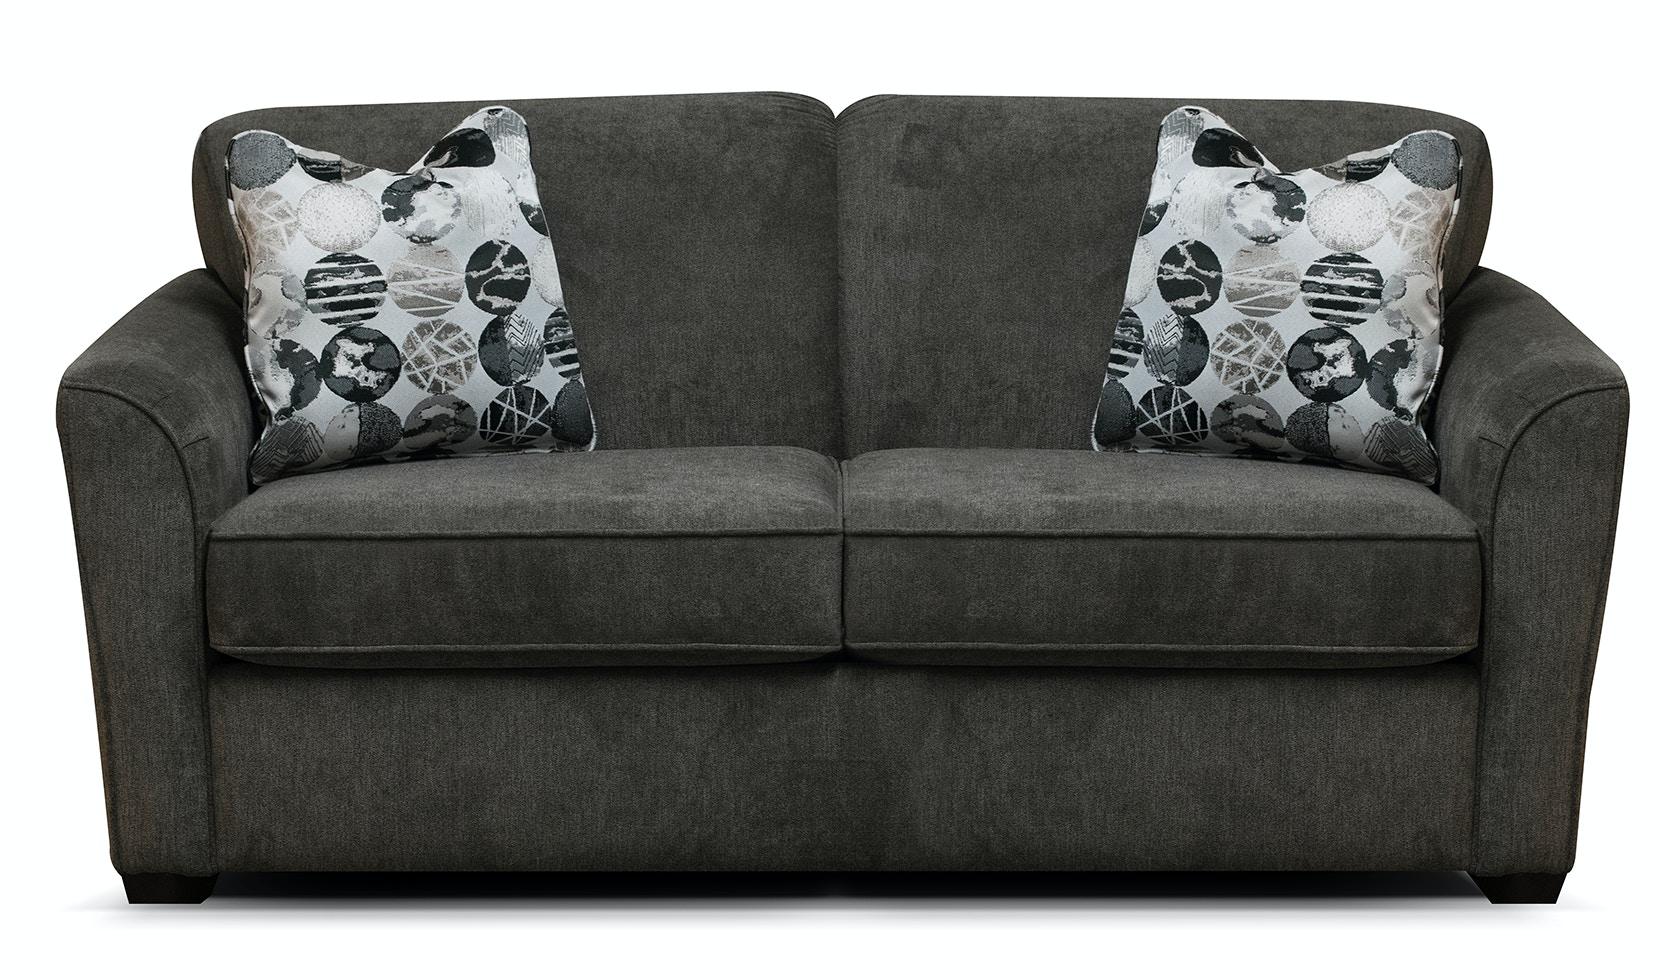 england living room smyrna full sleeper 308 england furniture rh englandfurniture com Gold Sofa and Loveseat Furniture Faux Leather Reclining Sofa and Loveseat